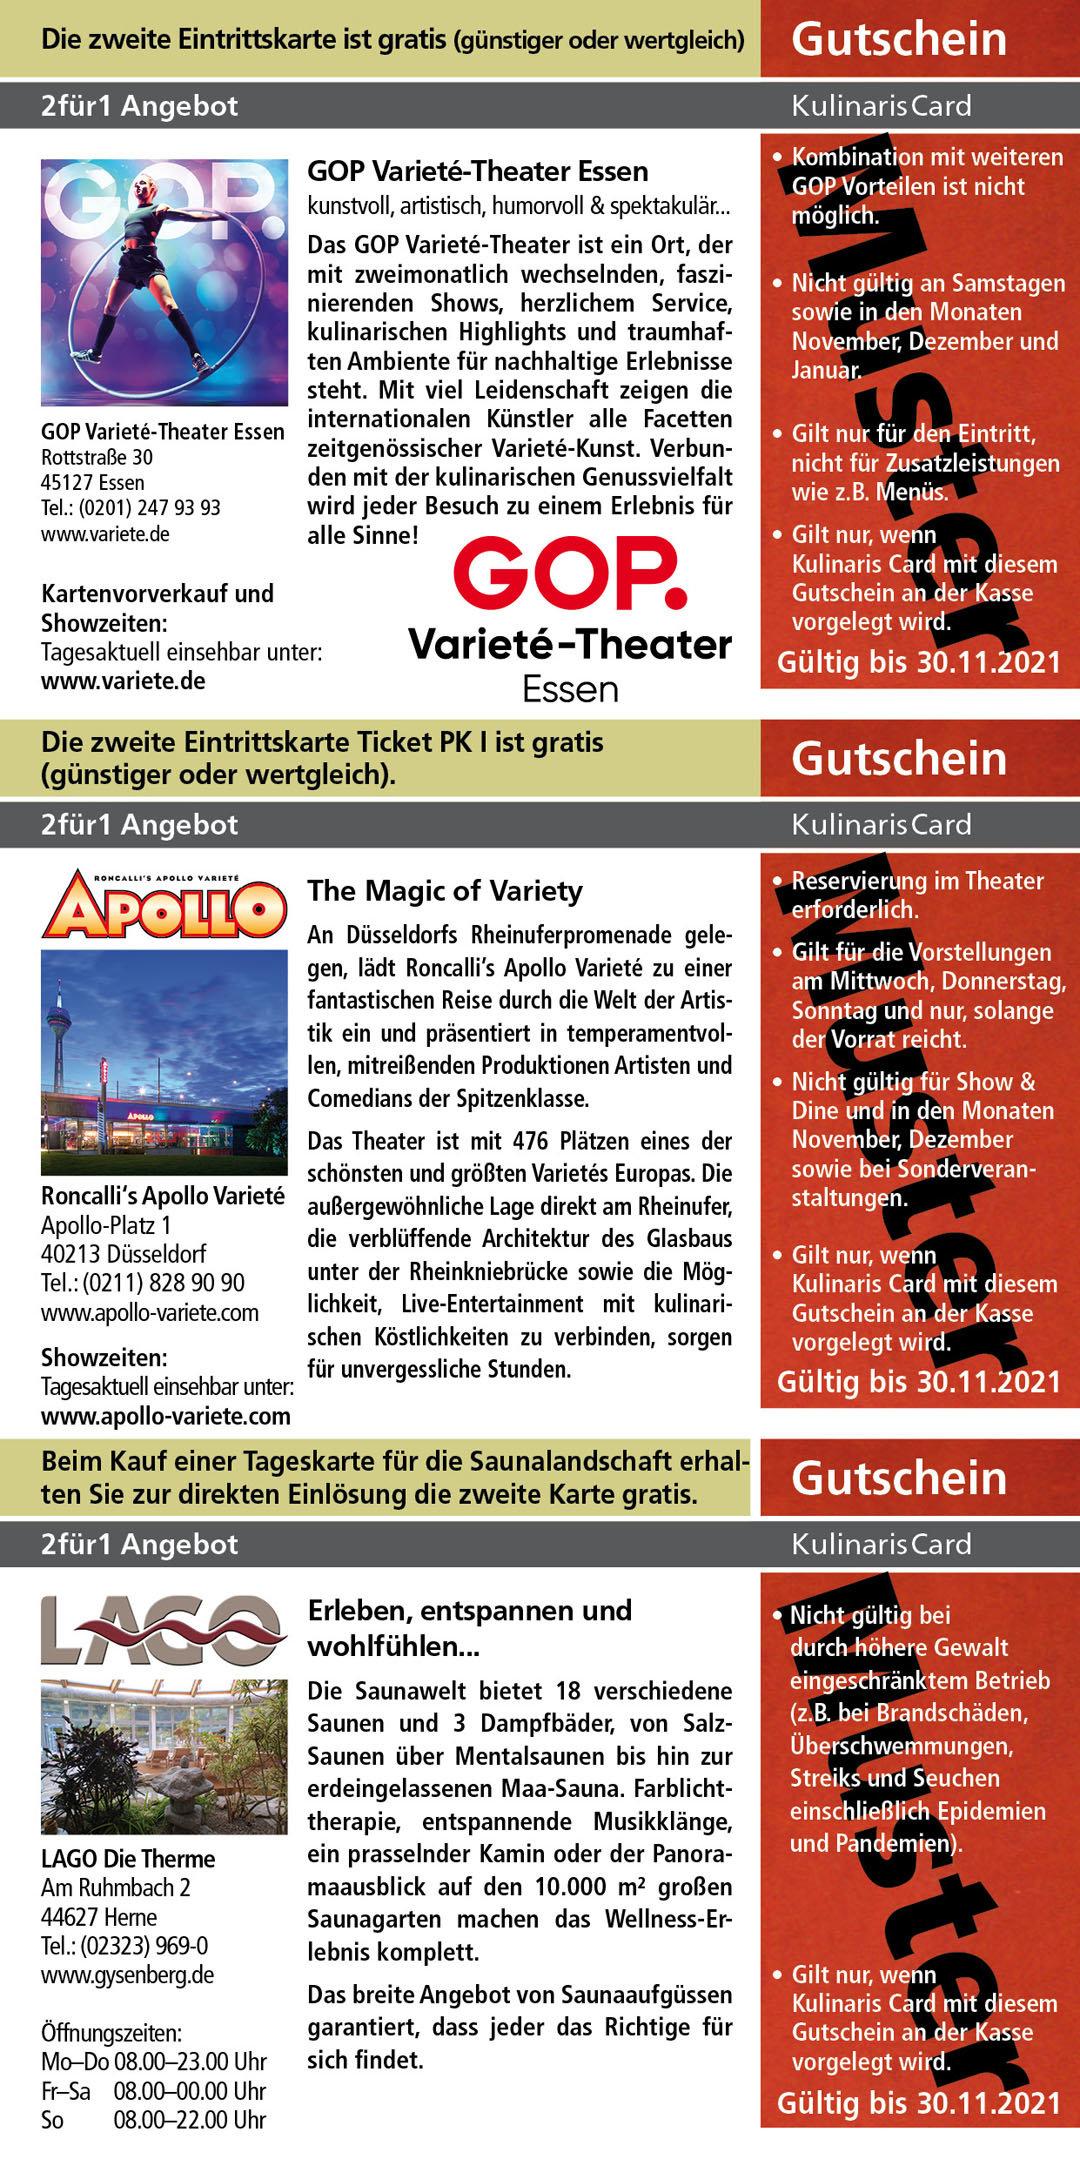 Roncalli's Apollo Varieté www.apollo-variete.com